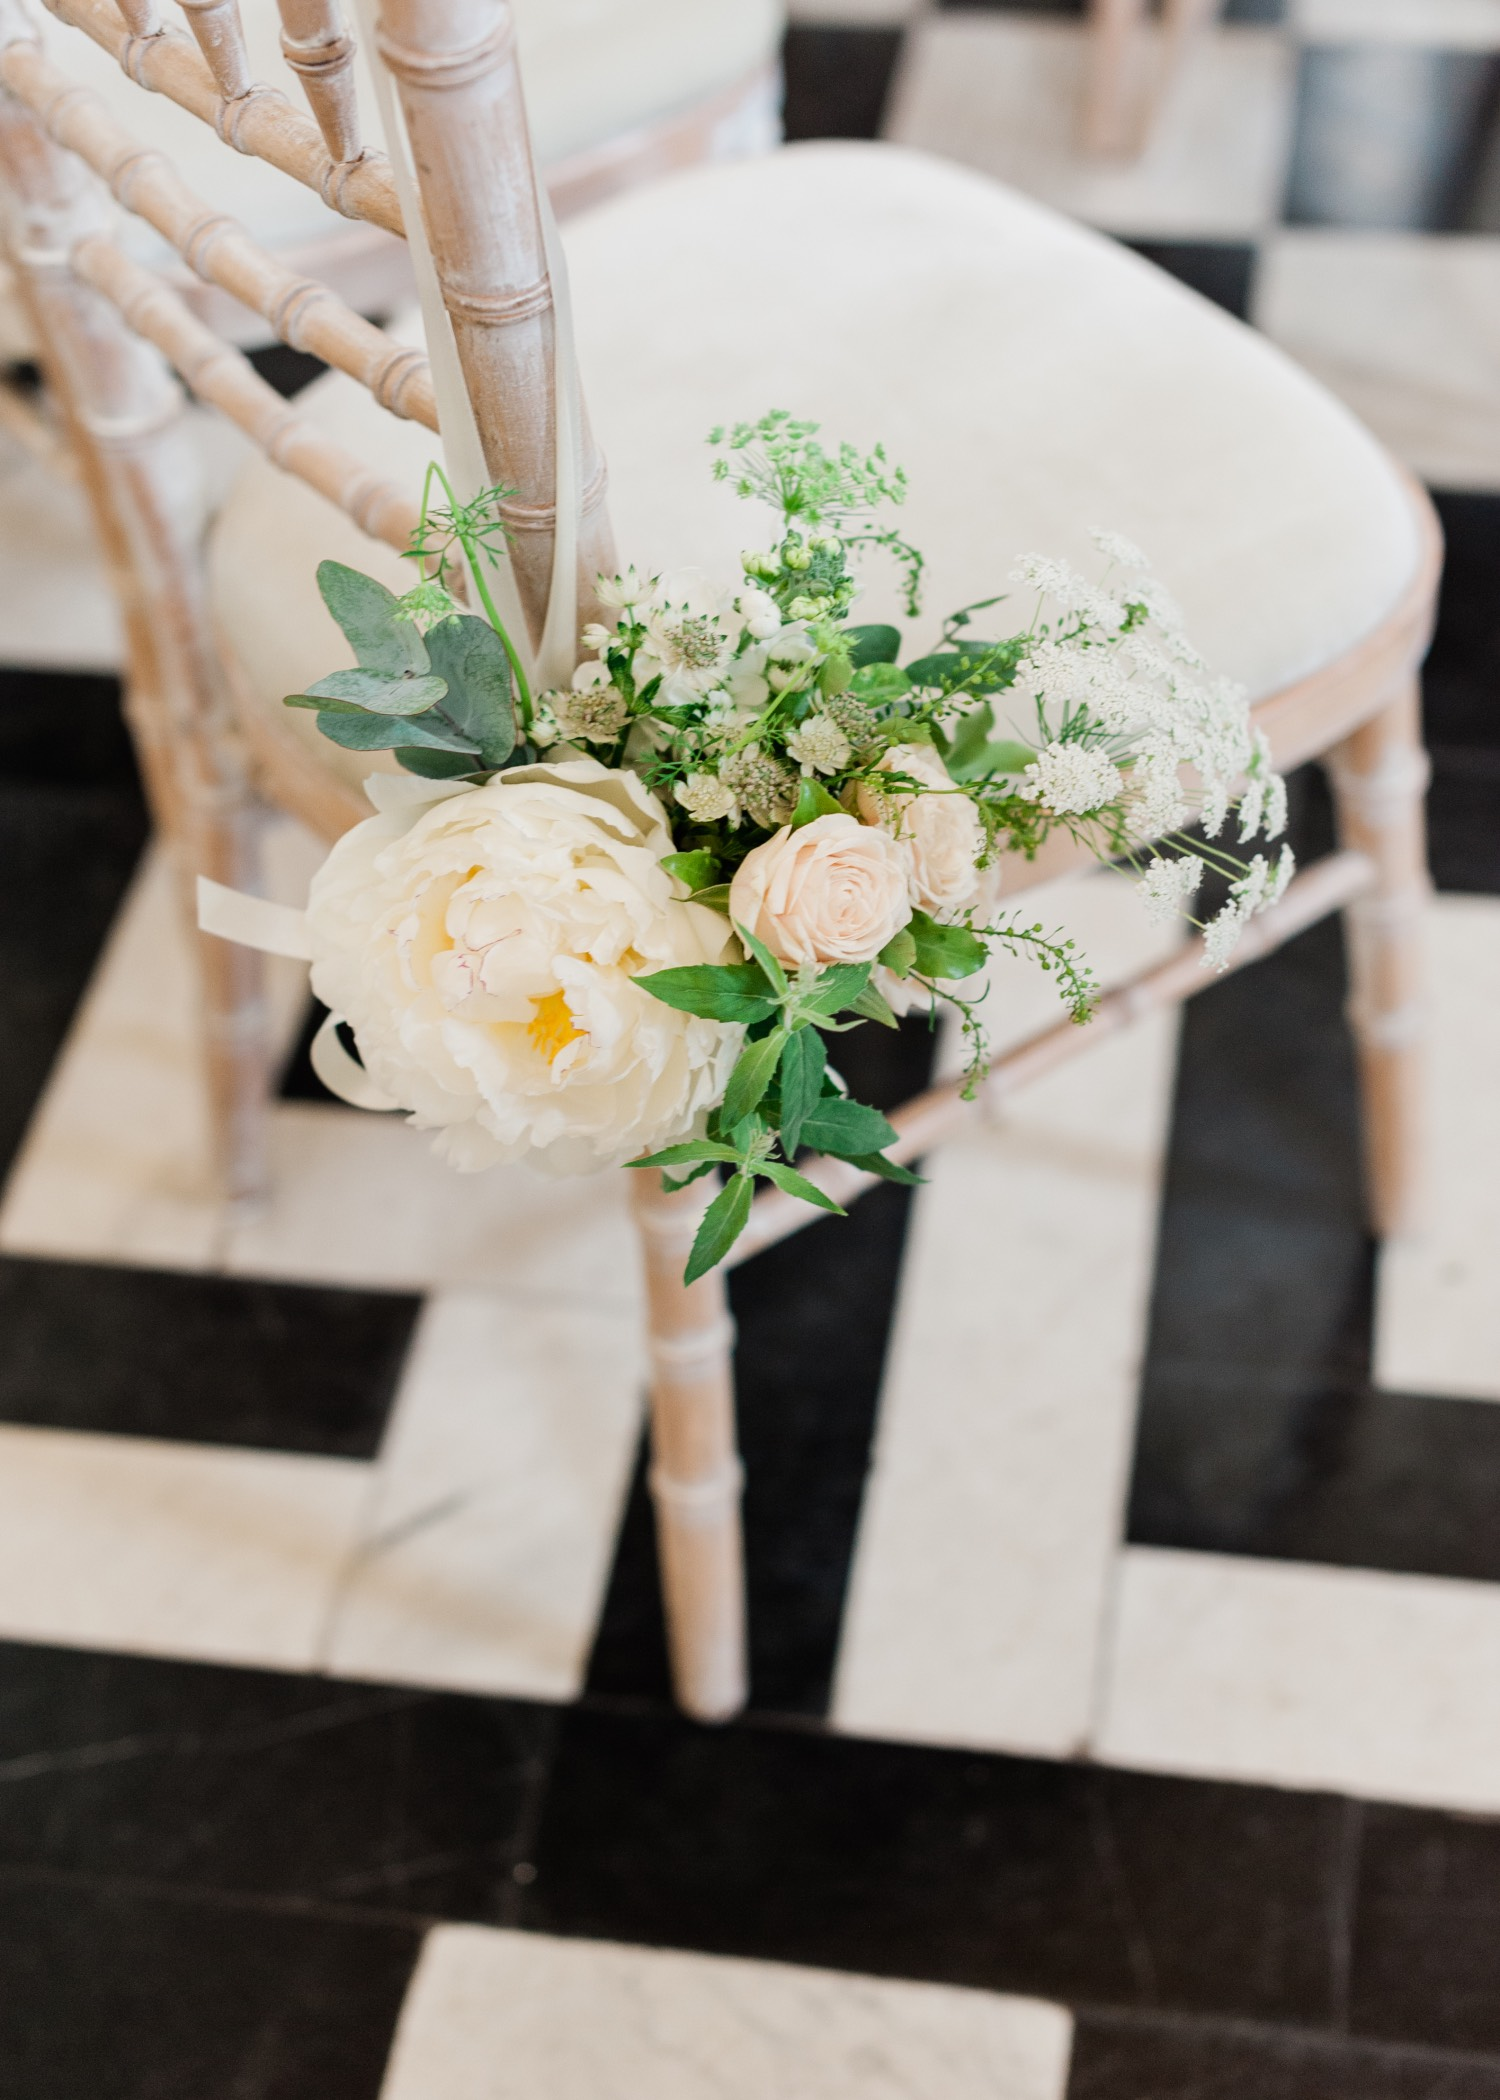 Littleton-Rose-Syon-House-London-Wedding-Planner-Pew-Ends.jpg